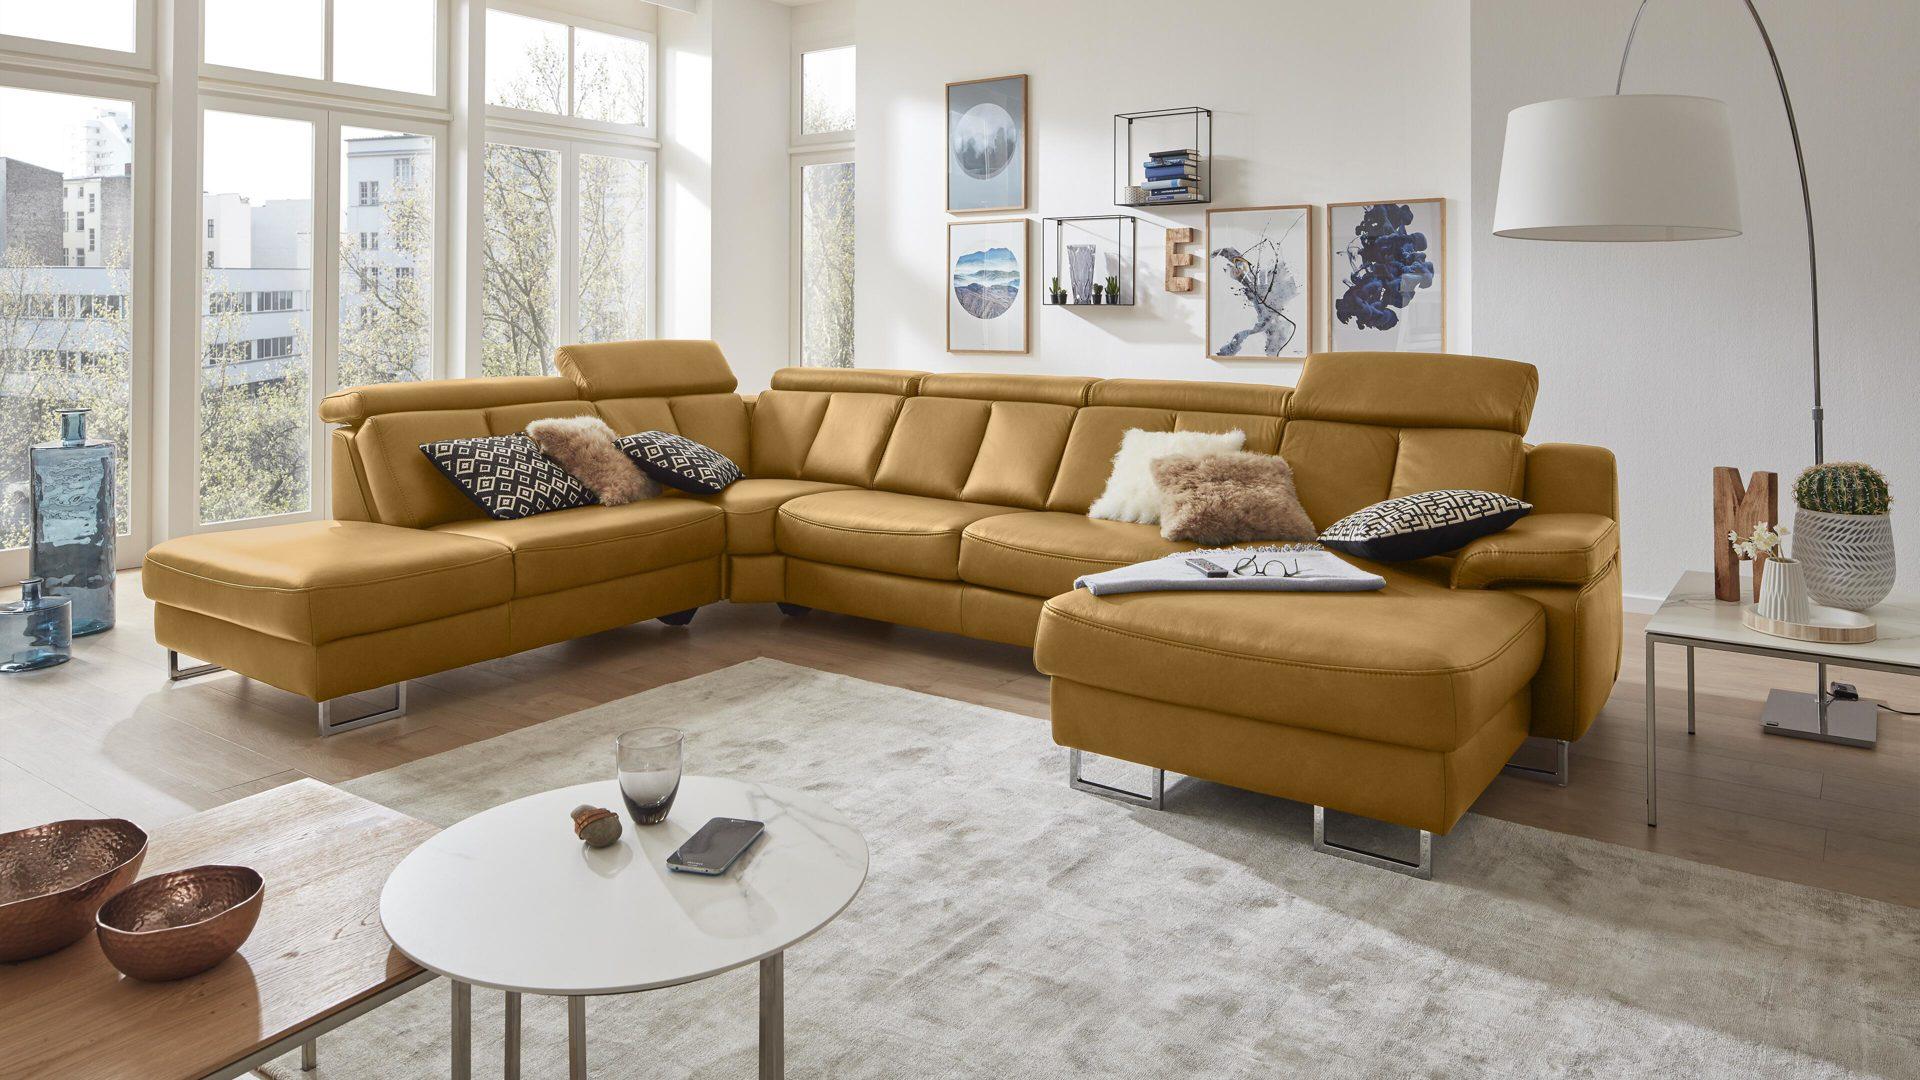 Interliving Sofa Serie 4050 Wohnlandschaft Kurkumafarbenes